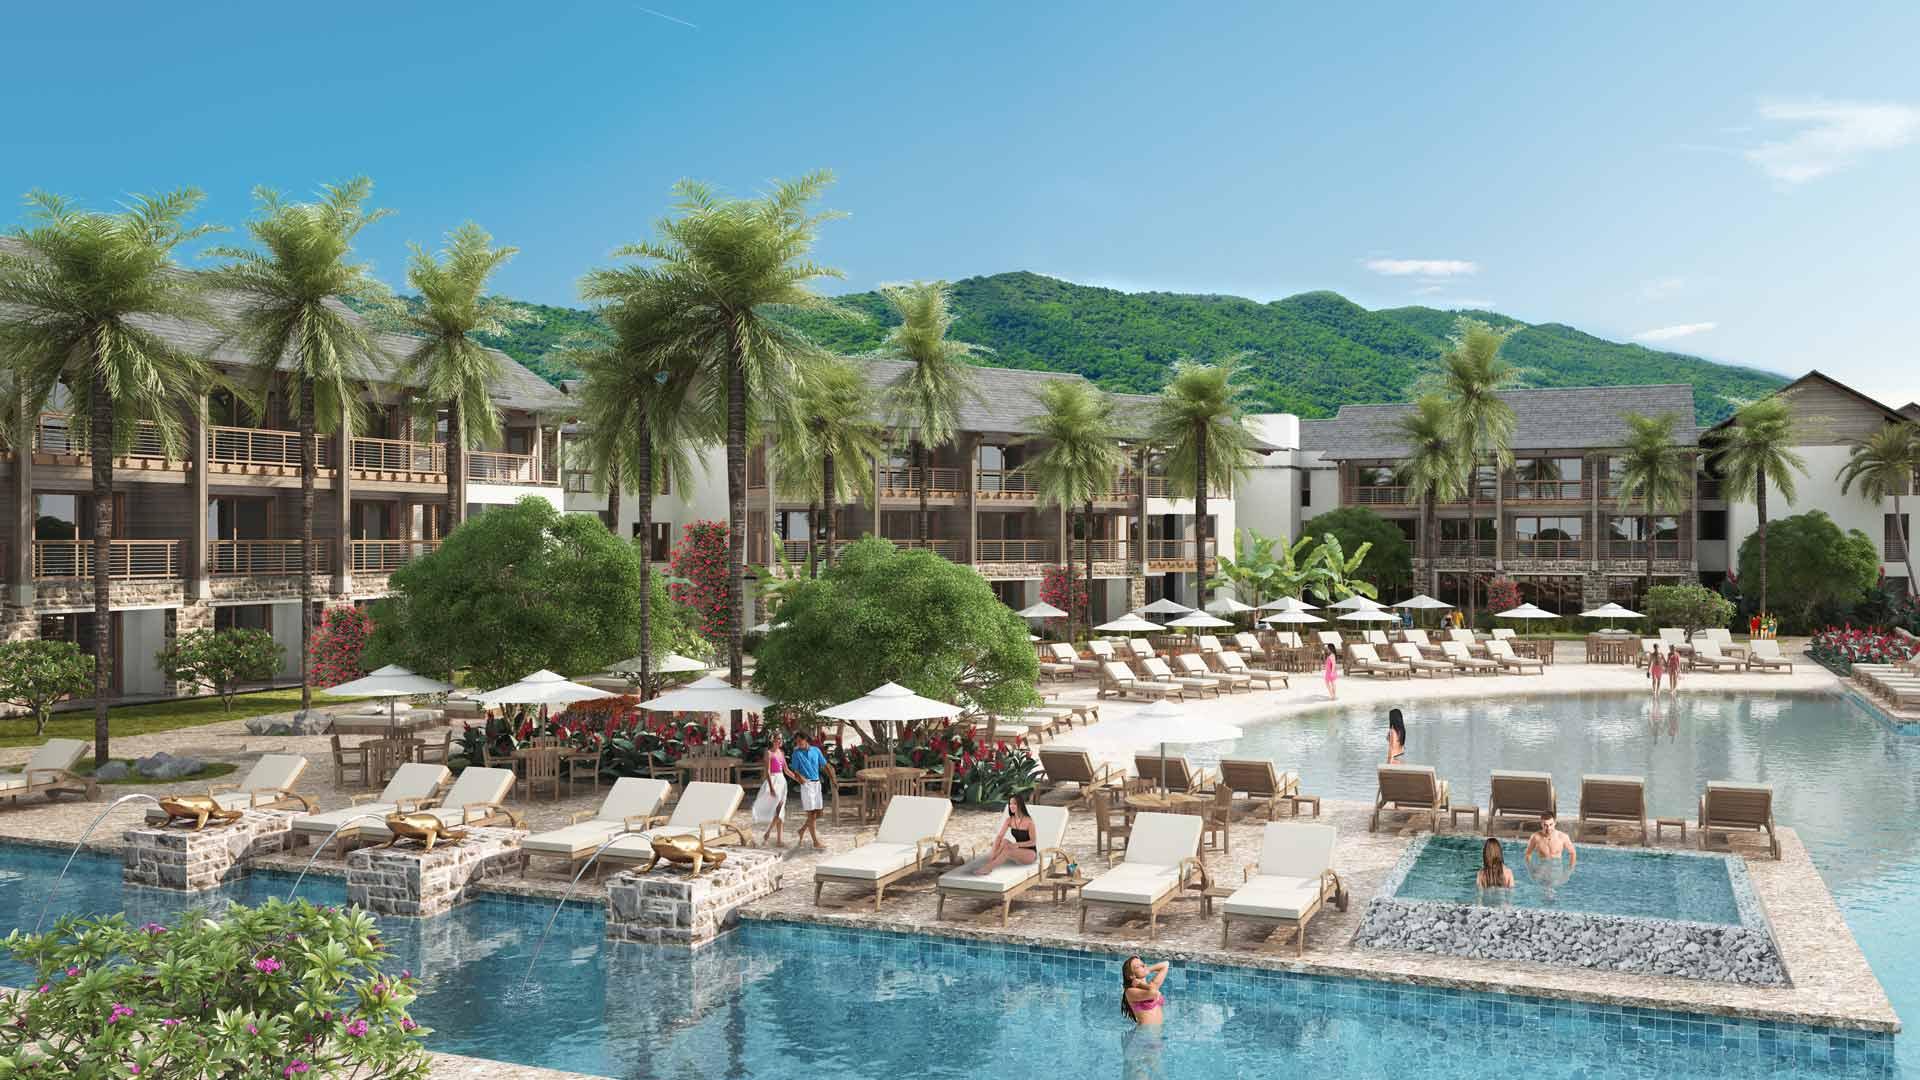 Cabrits Resort Kempinski - Source: http://www.rangedominica.com/